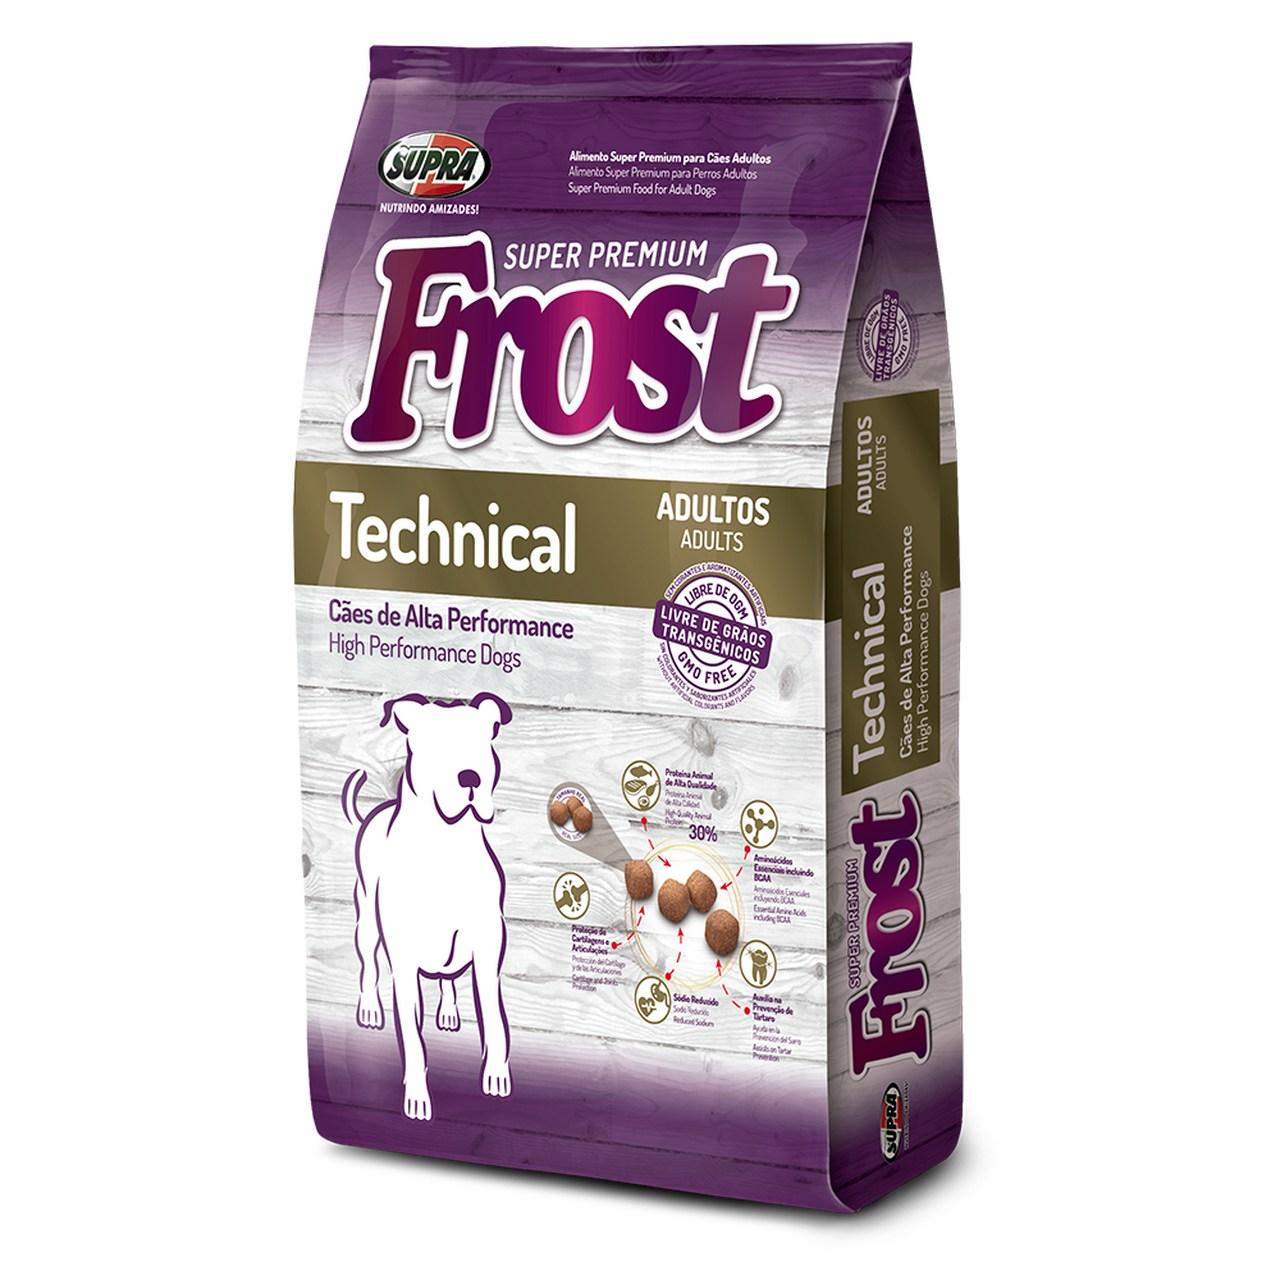 Ração Super Premium Frost Technical - 15 Kg